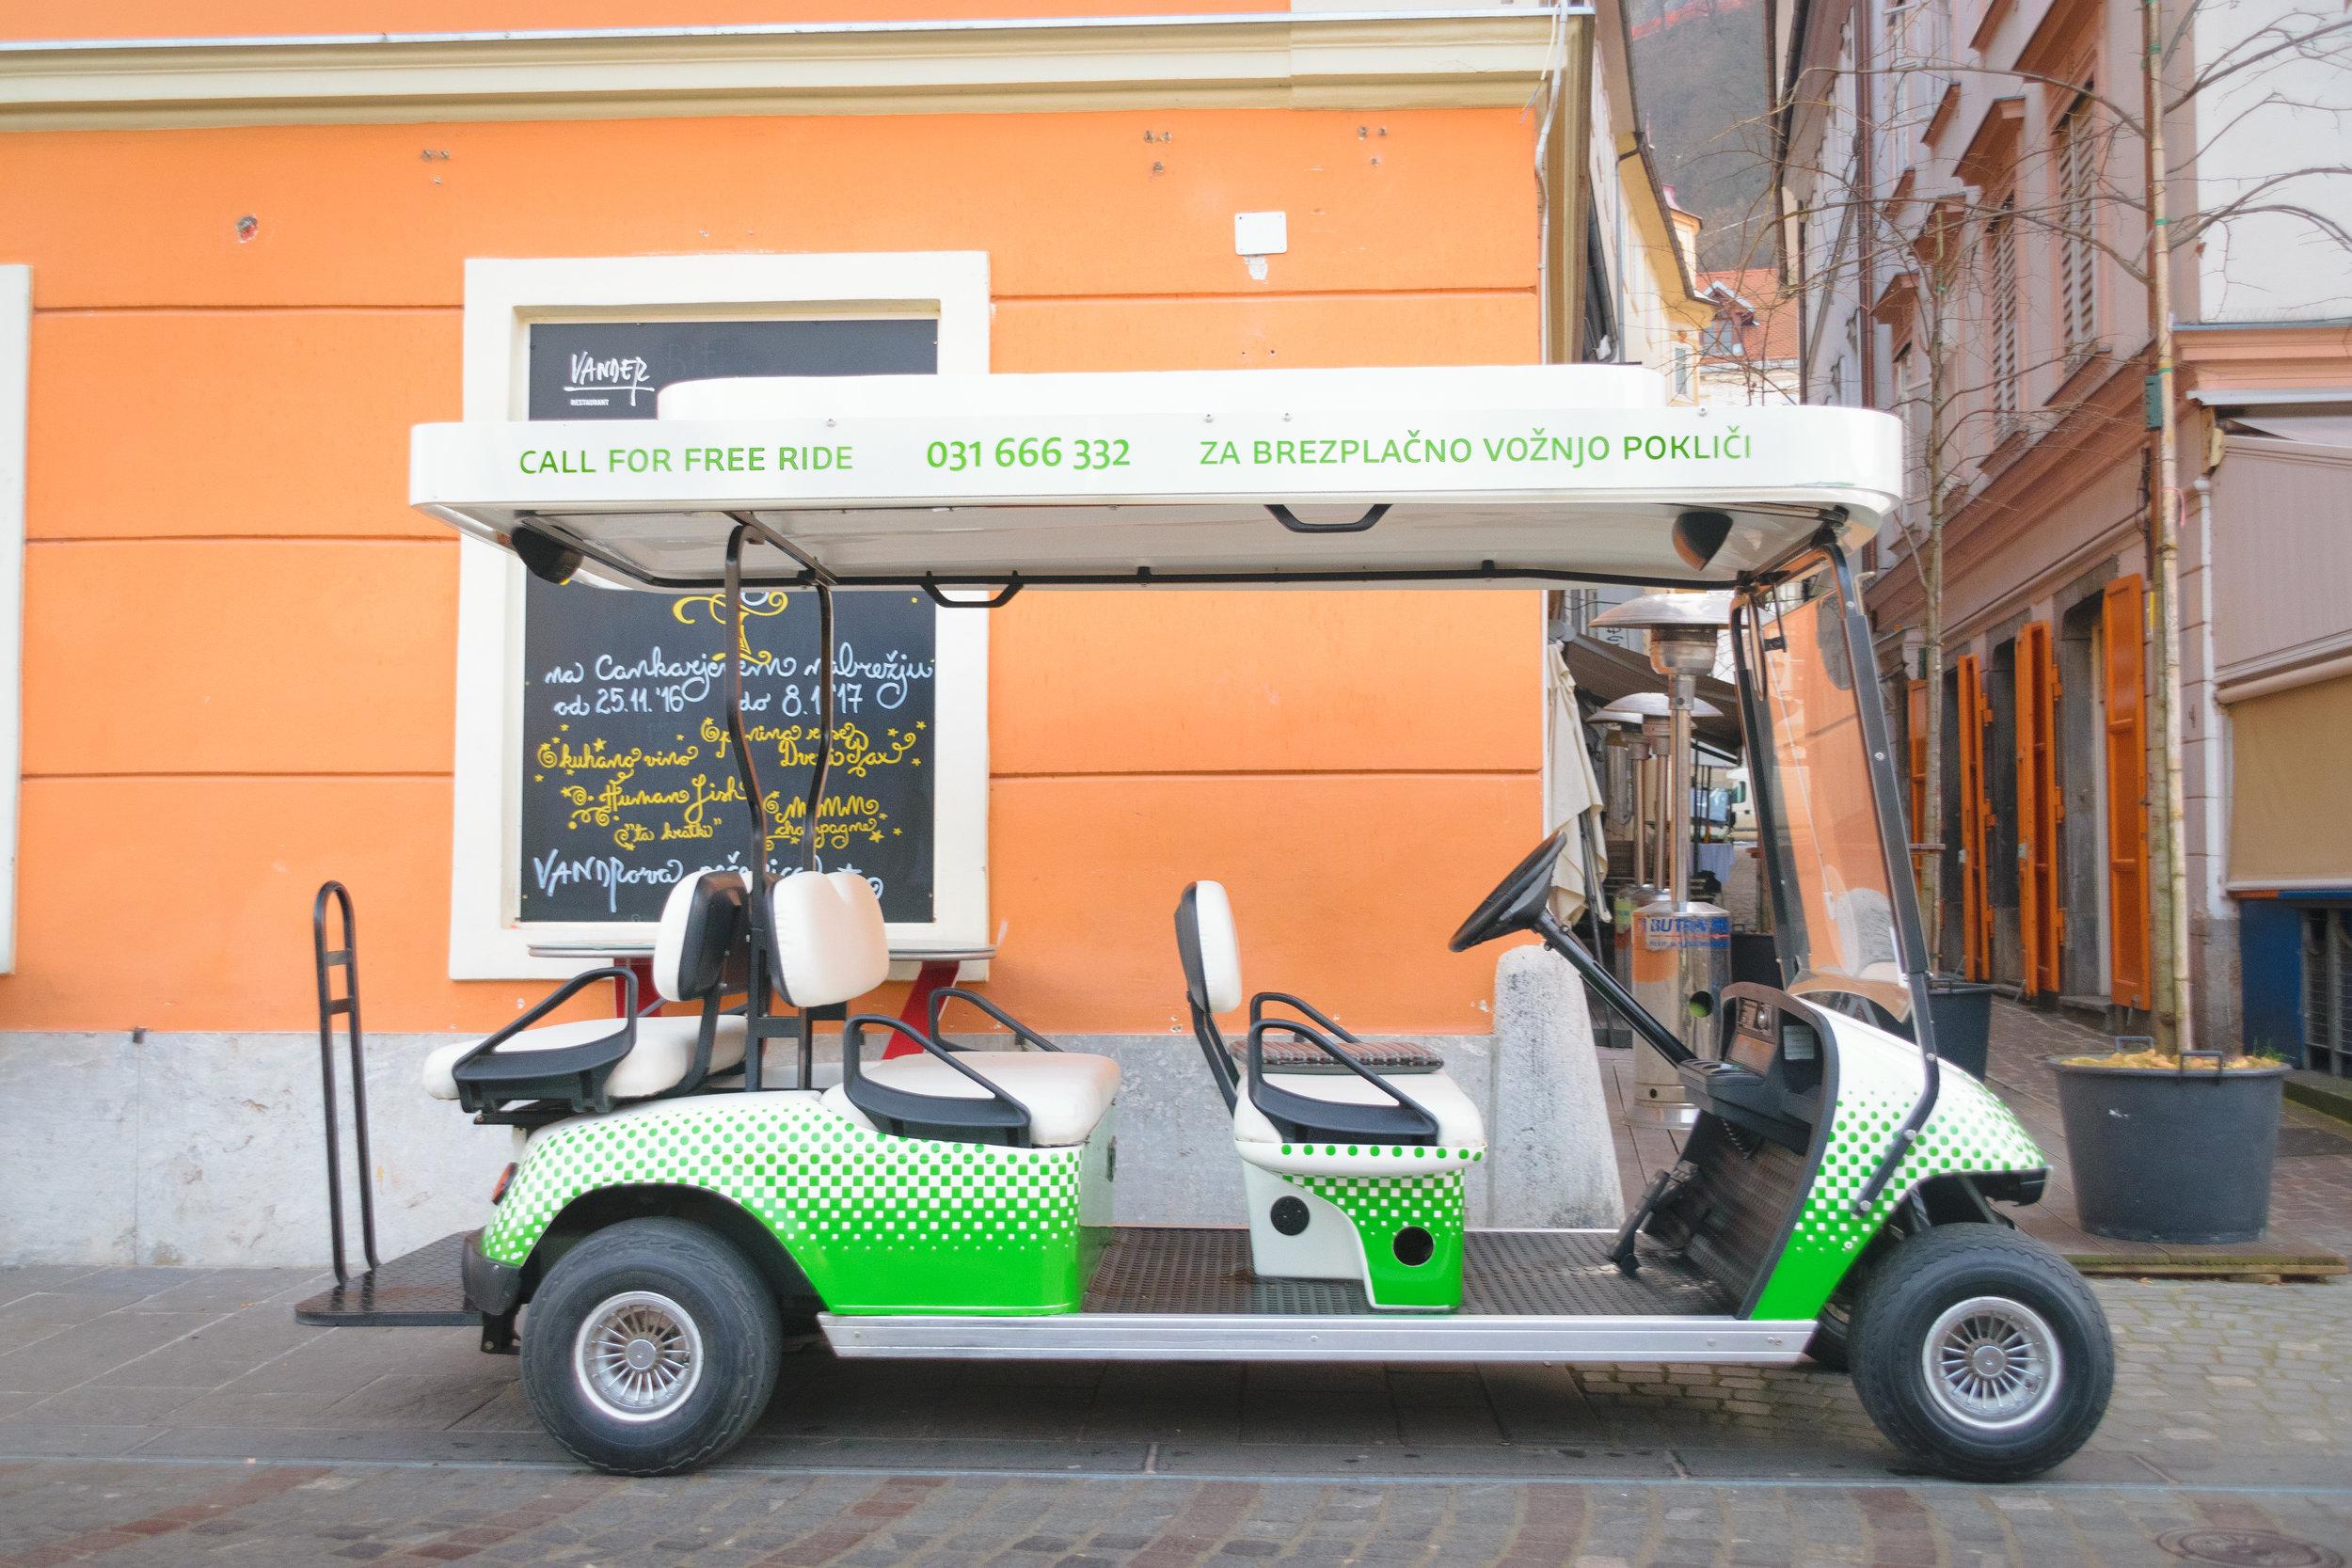 free, electric Kavalir taxi service